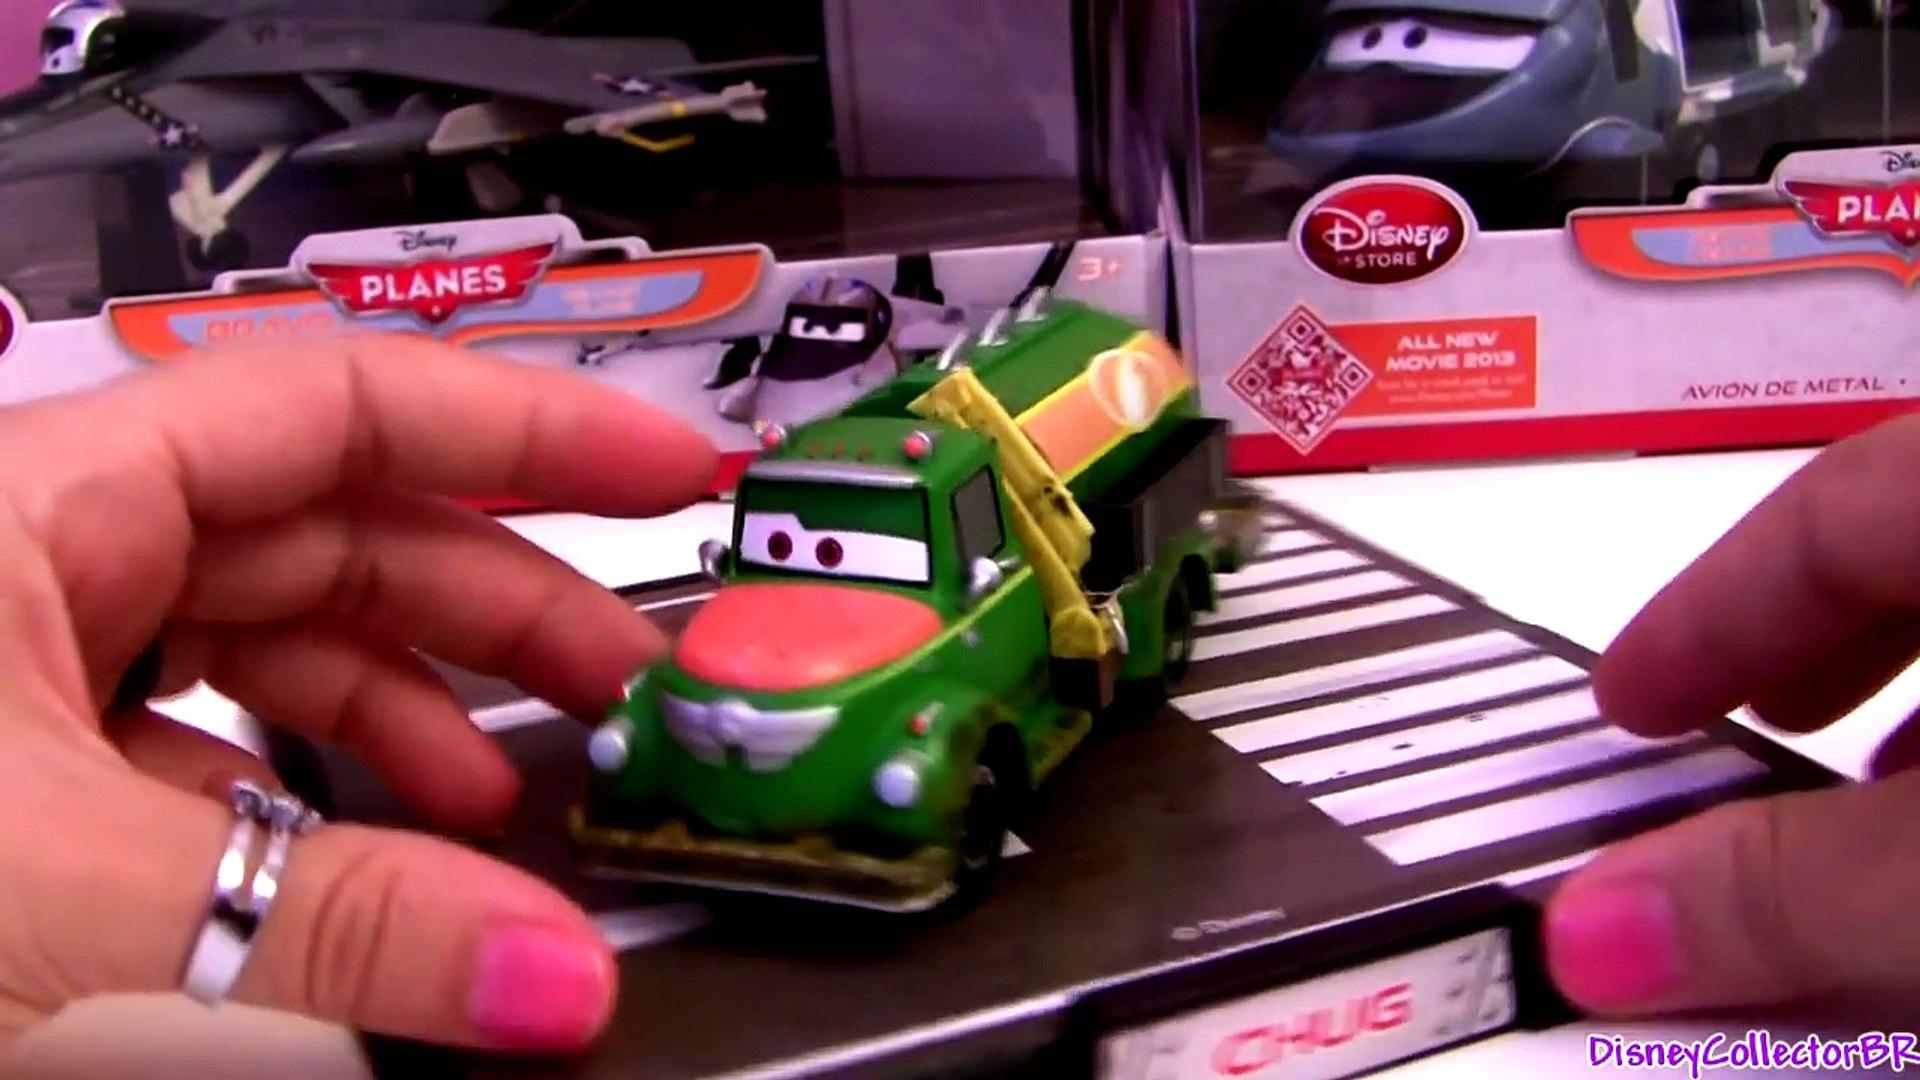 DISNEY PIXAR CARS 2 NED DIECAST PLANES DISNEY STORE